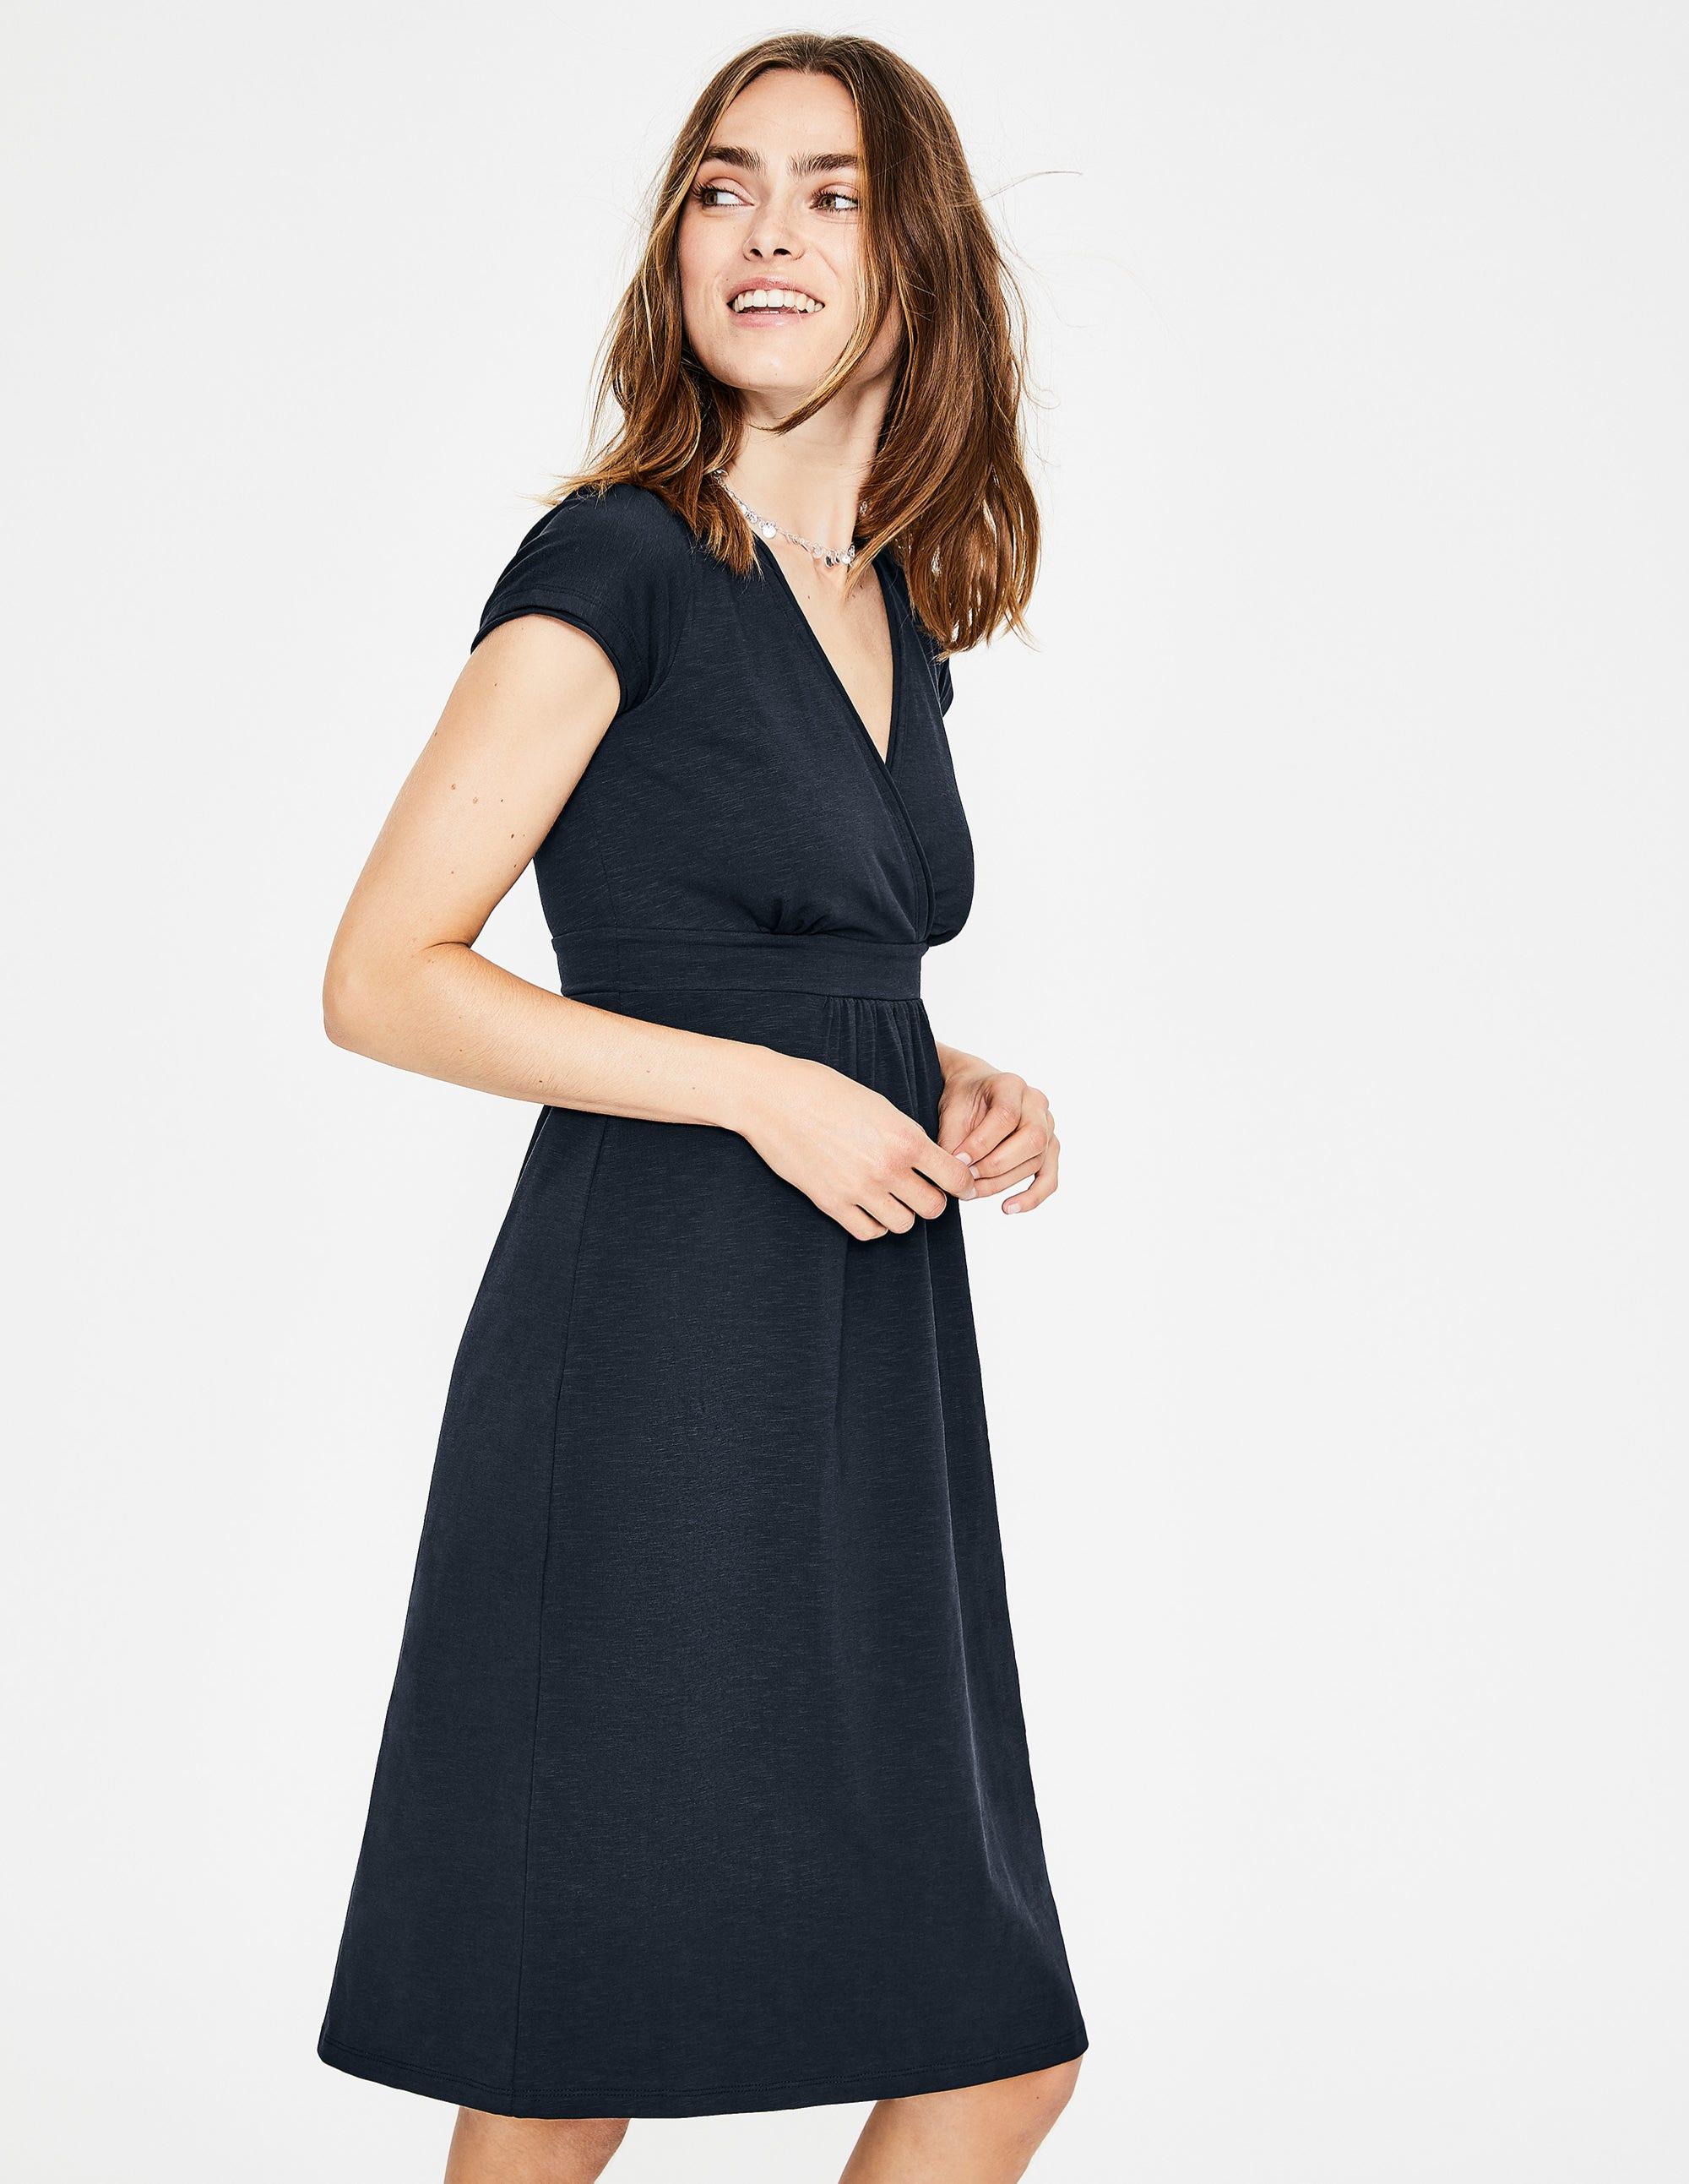 Décontractée Décontractée En Jersey Robe Robe Noir En Ifv7Yb6ymg